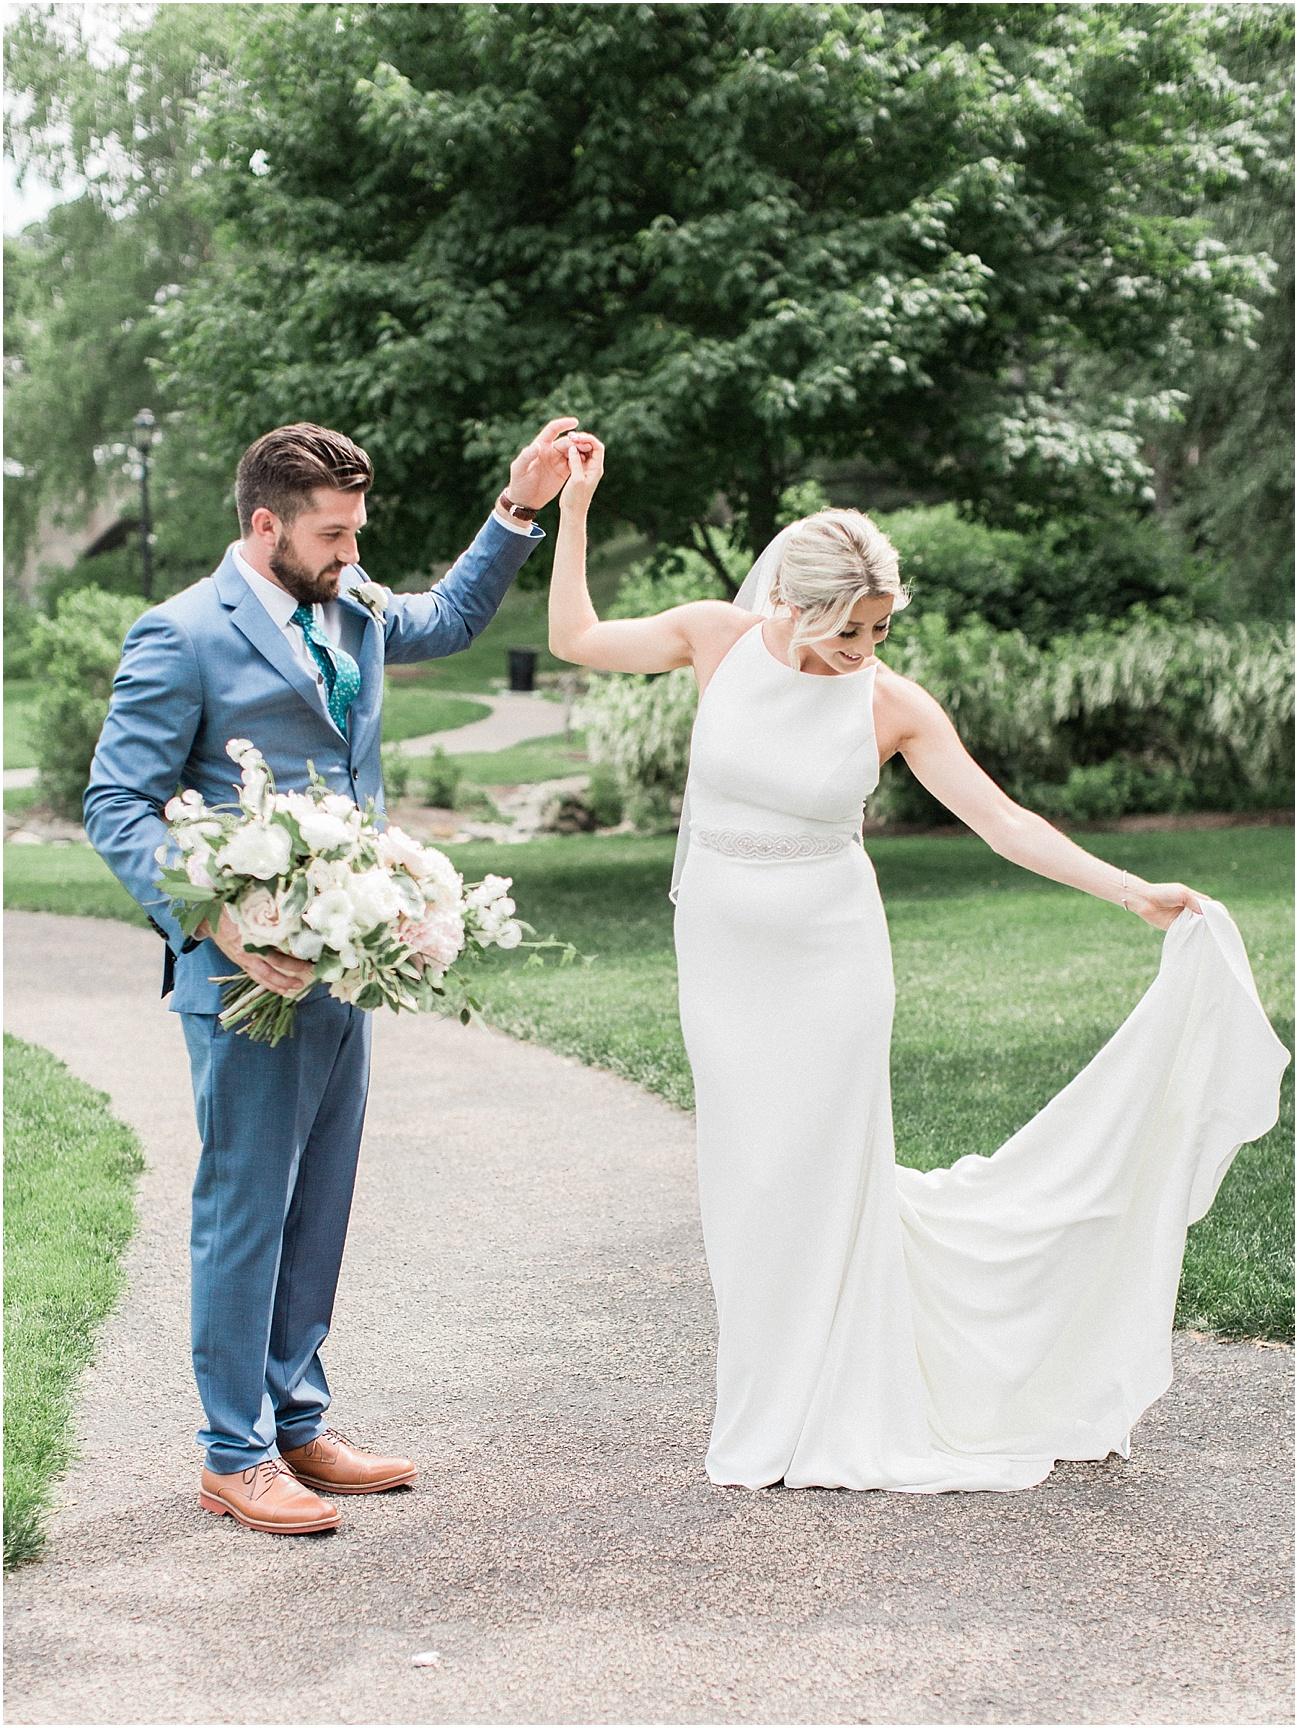 lindsey_paul_indian_pond_country_club_wild_dahlia_brewster_gardens_plymouth_cape_cod_boston_wedding_photographer_meredith_jane_photography_photo_0374.jpg